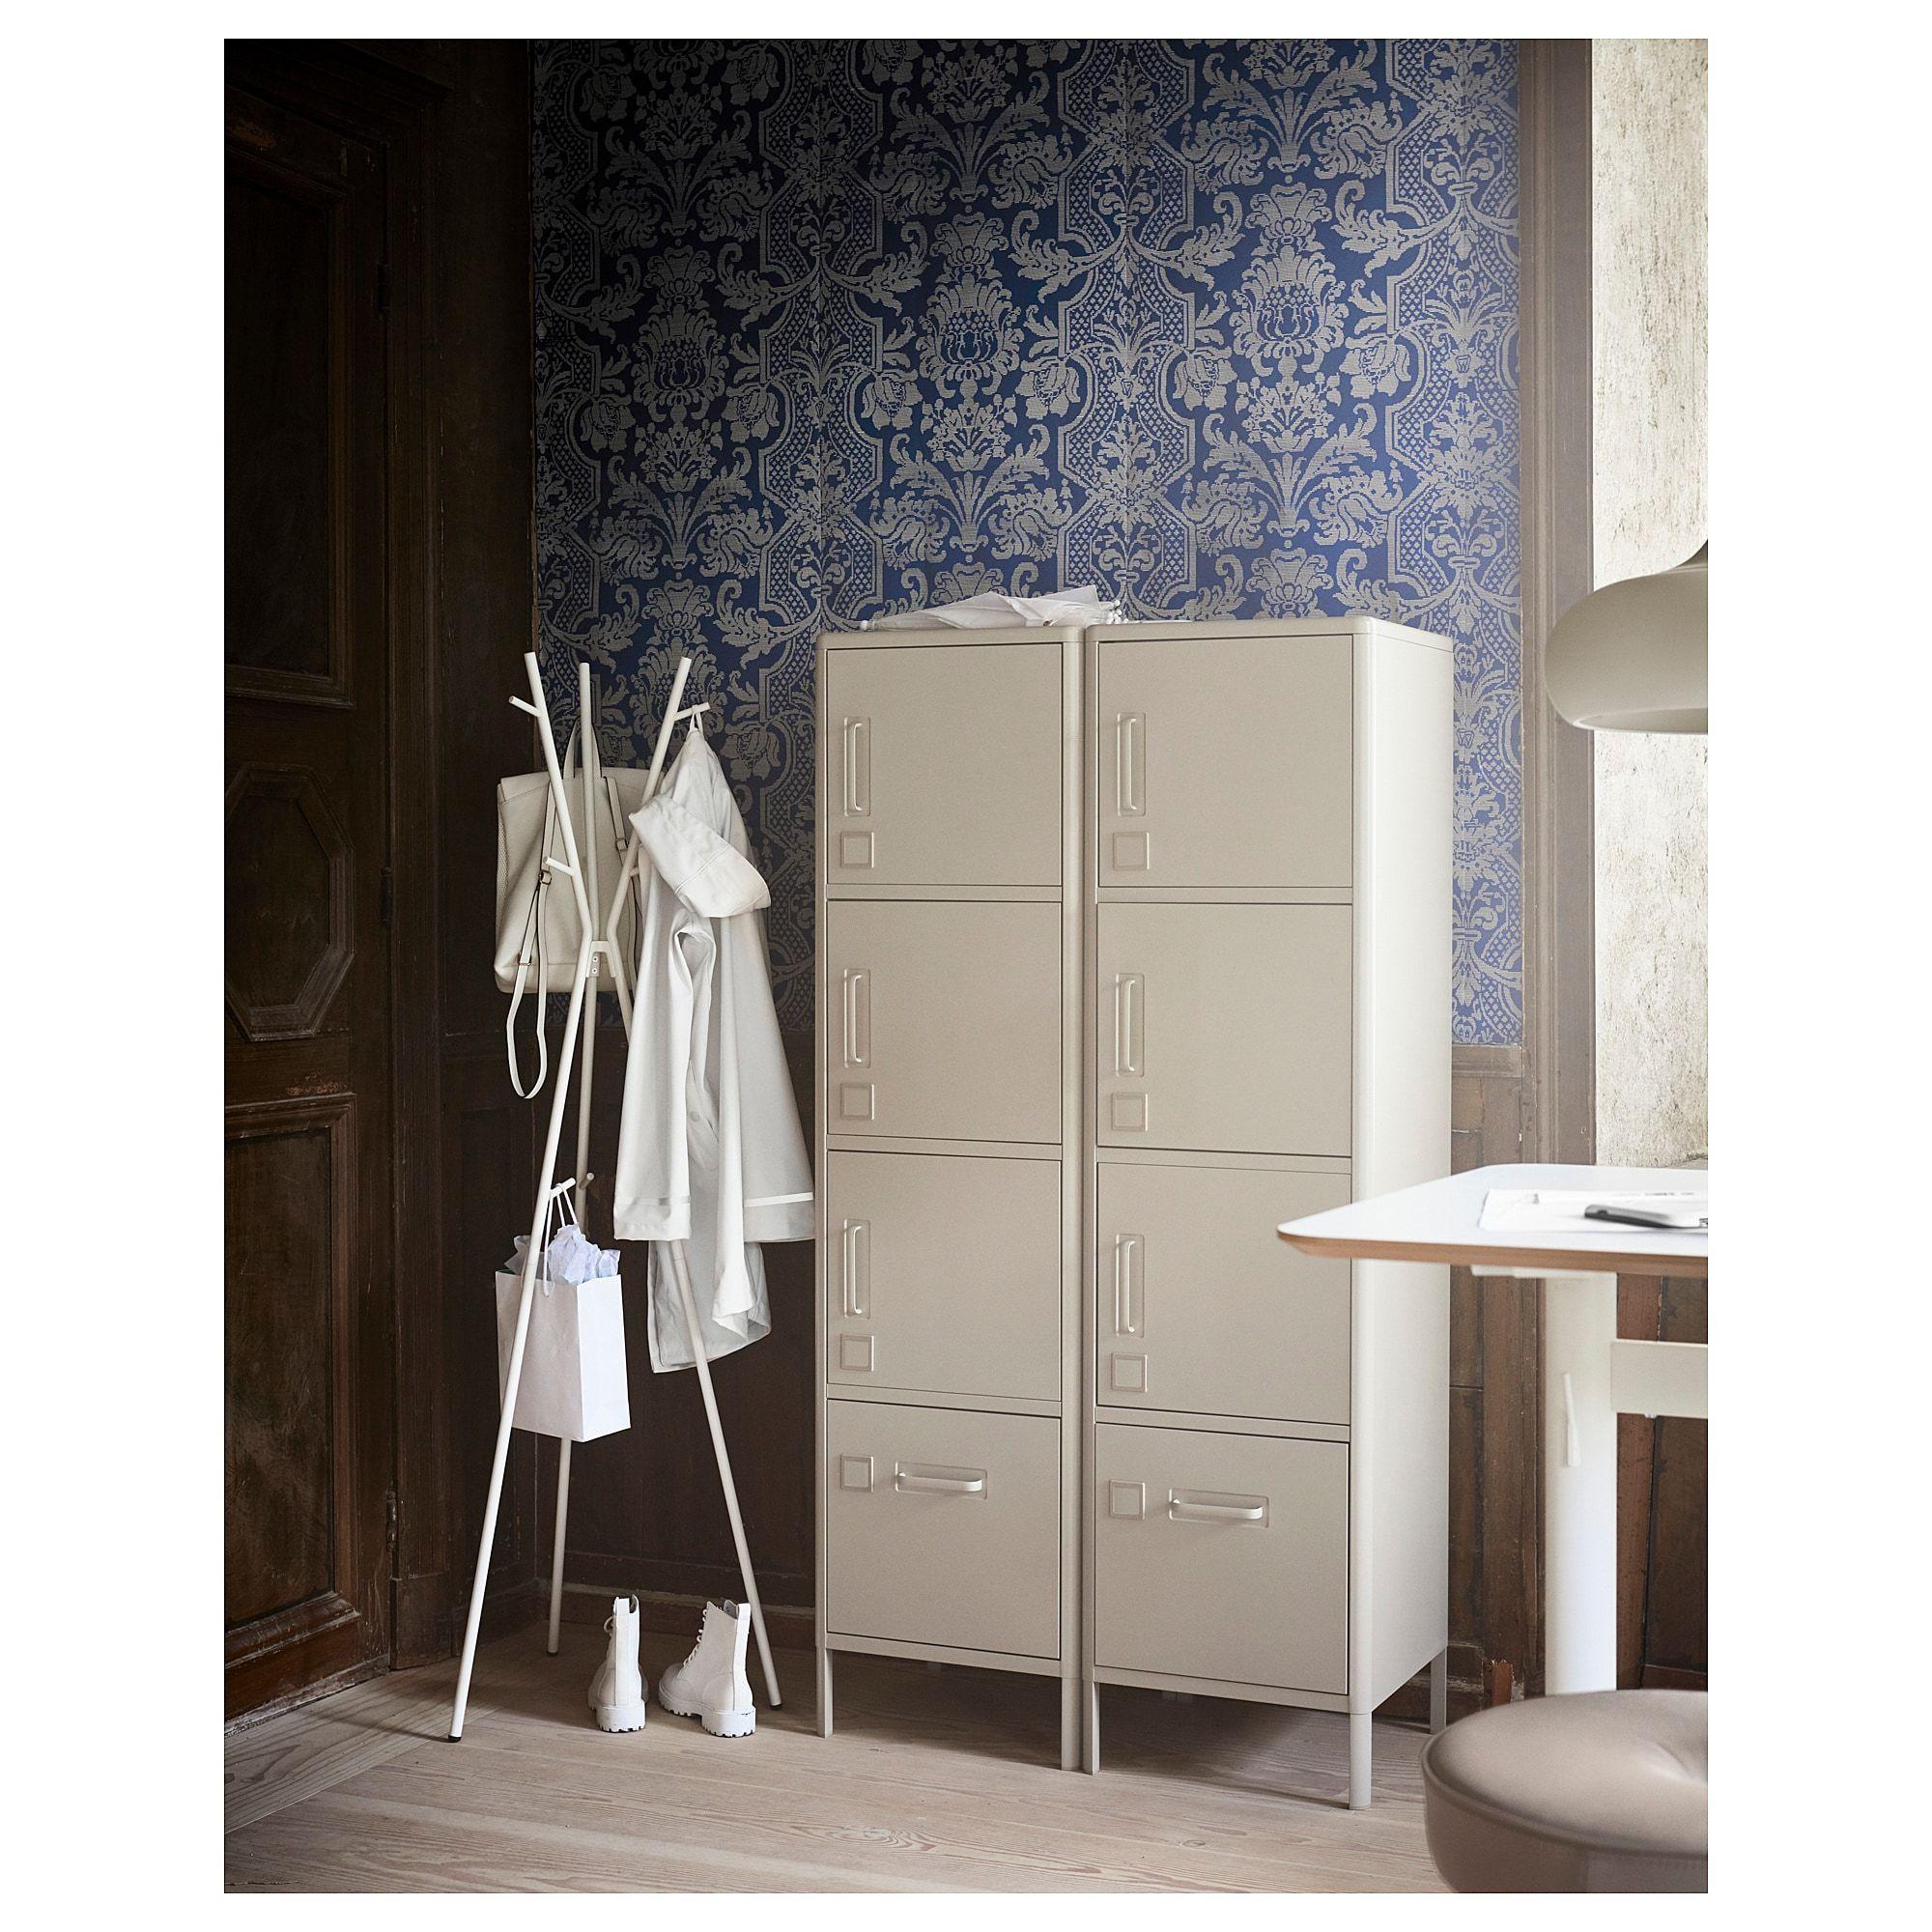 Ikea Idasen Beige High Cabinet With Smart Lock In 2019